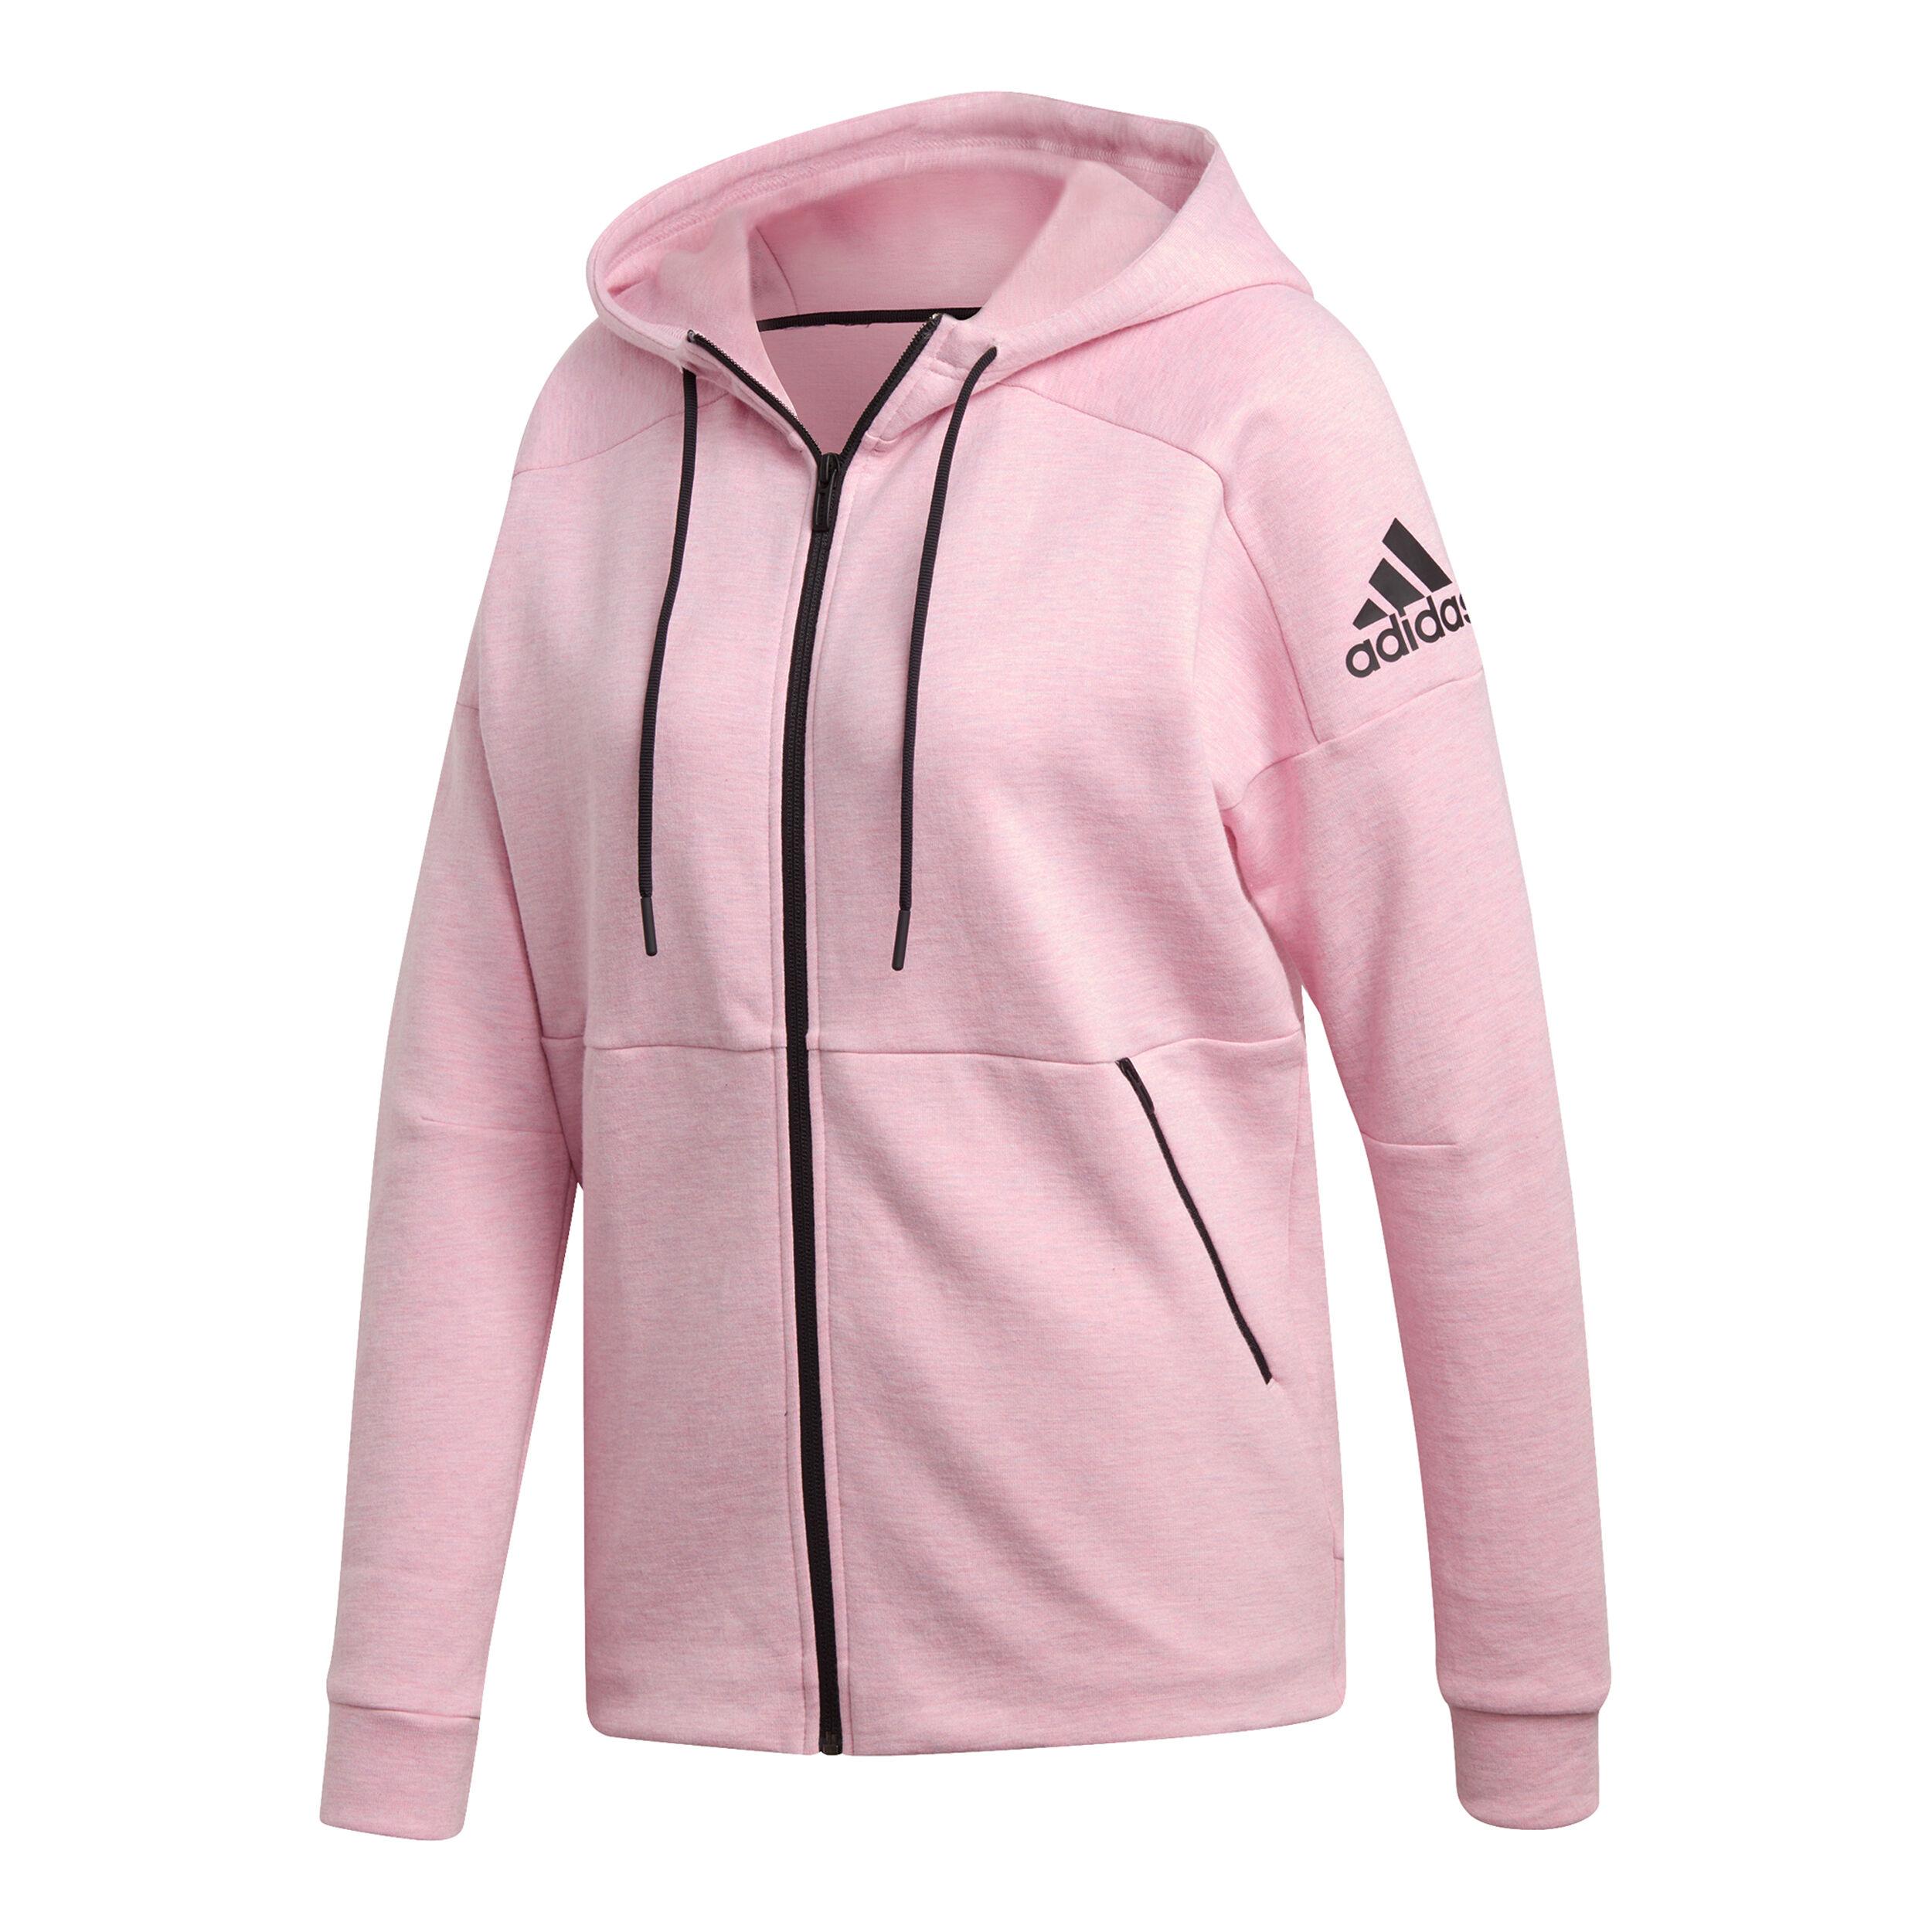 Adidas Stadium Hoodie Sweat & träningsjacka Dam köp